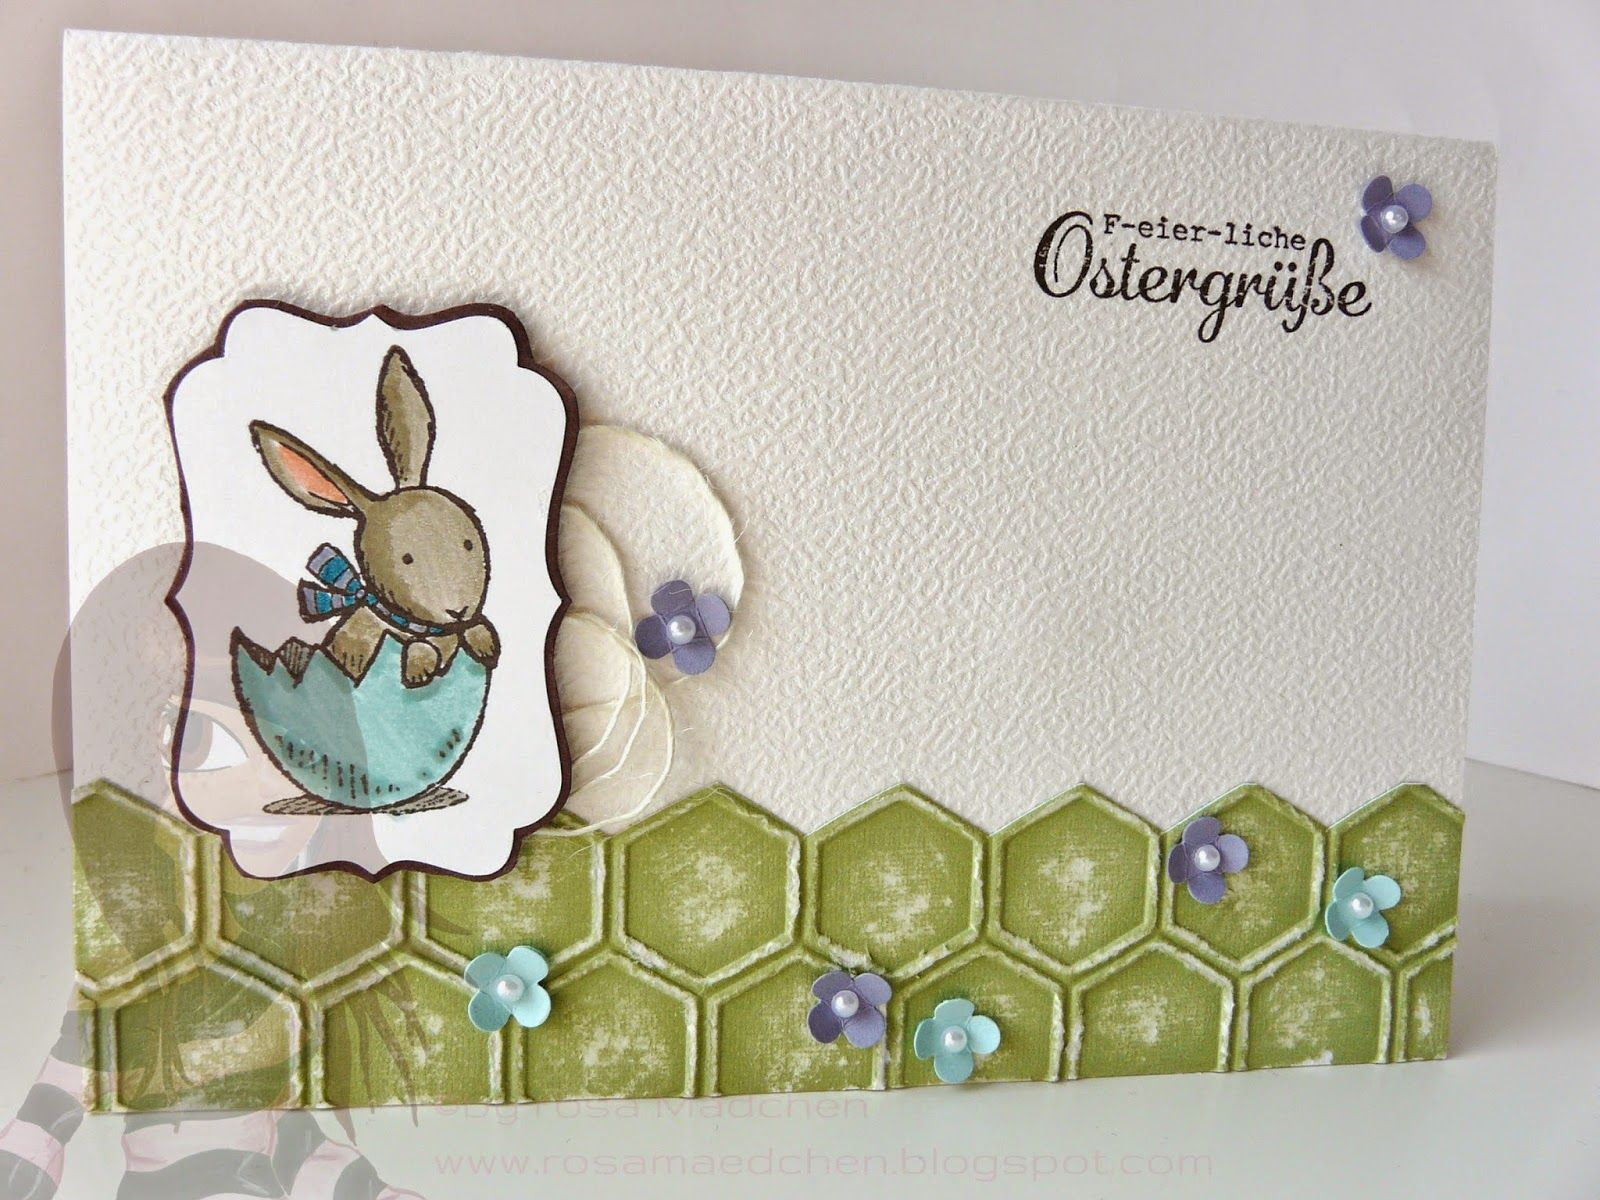 Stampin' Up! - Osterkarte - Hasenparade - Dekoratives Etikett - Itty Bitty - Honigwaben - rosamaedchen.blogspot.de